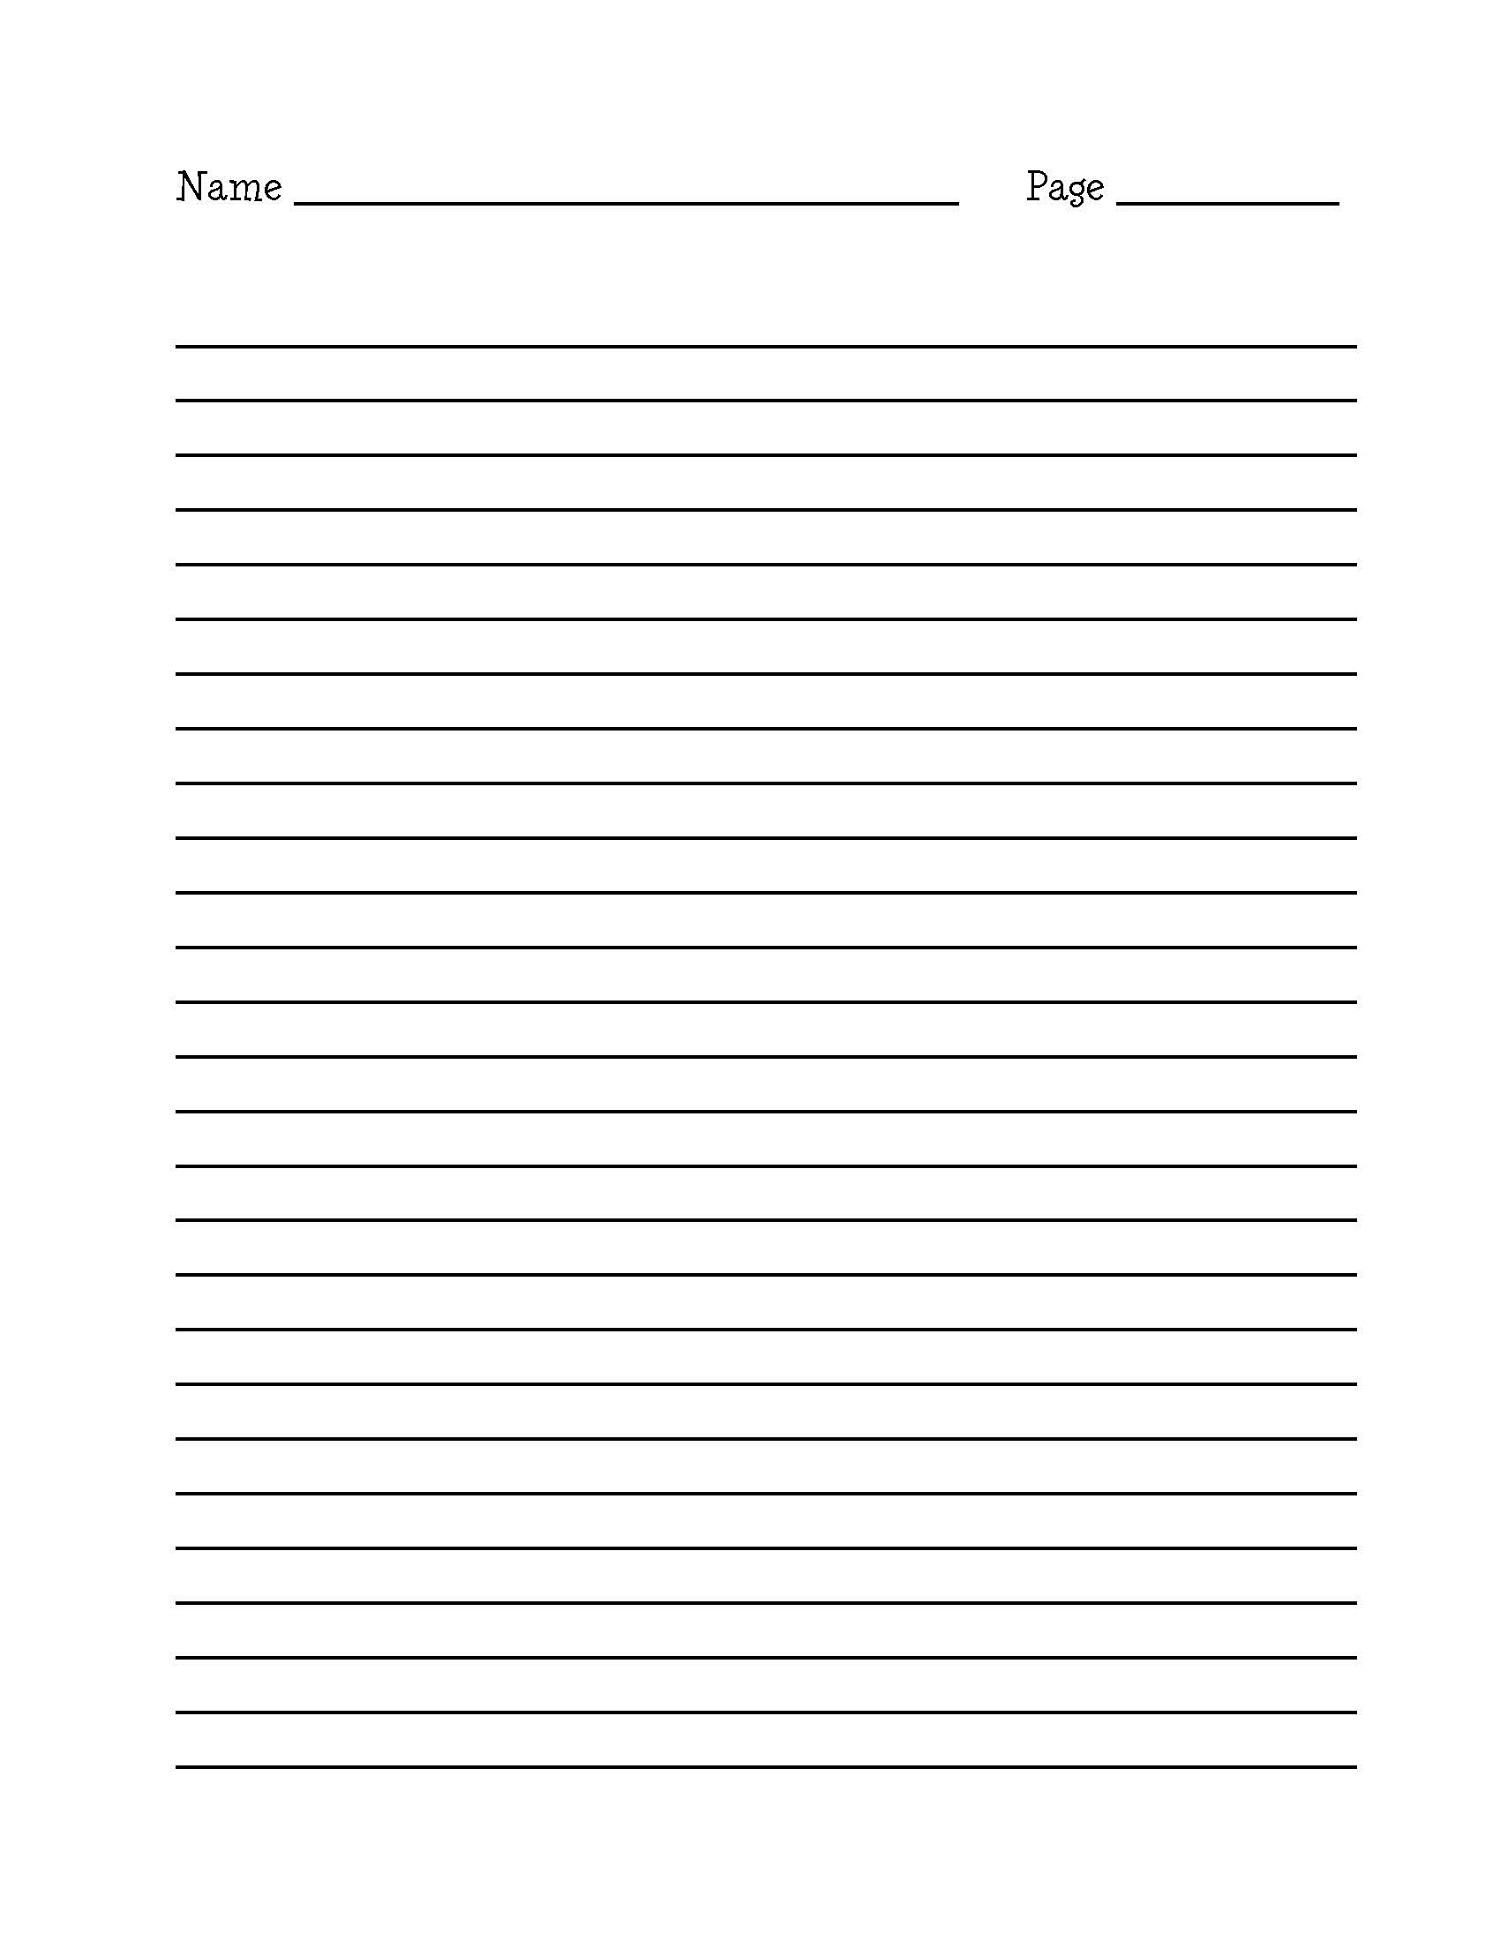 Free Writing Paper Doc Printable Writing Paper Border Writing - Free Printable Writing Paper